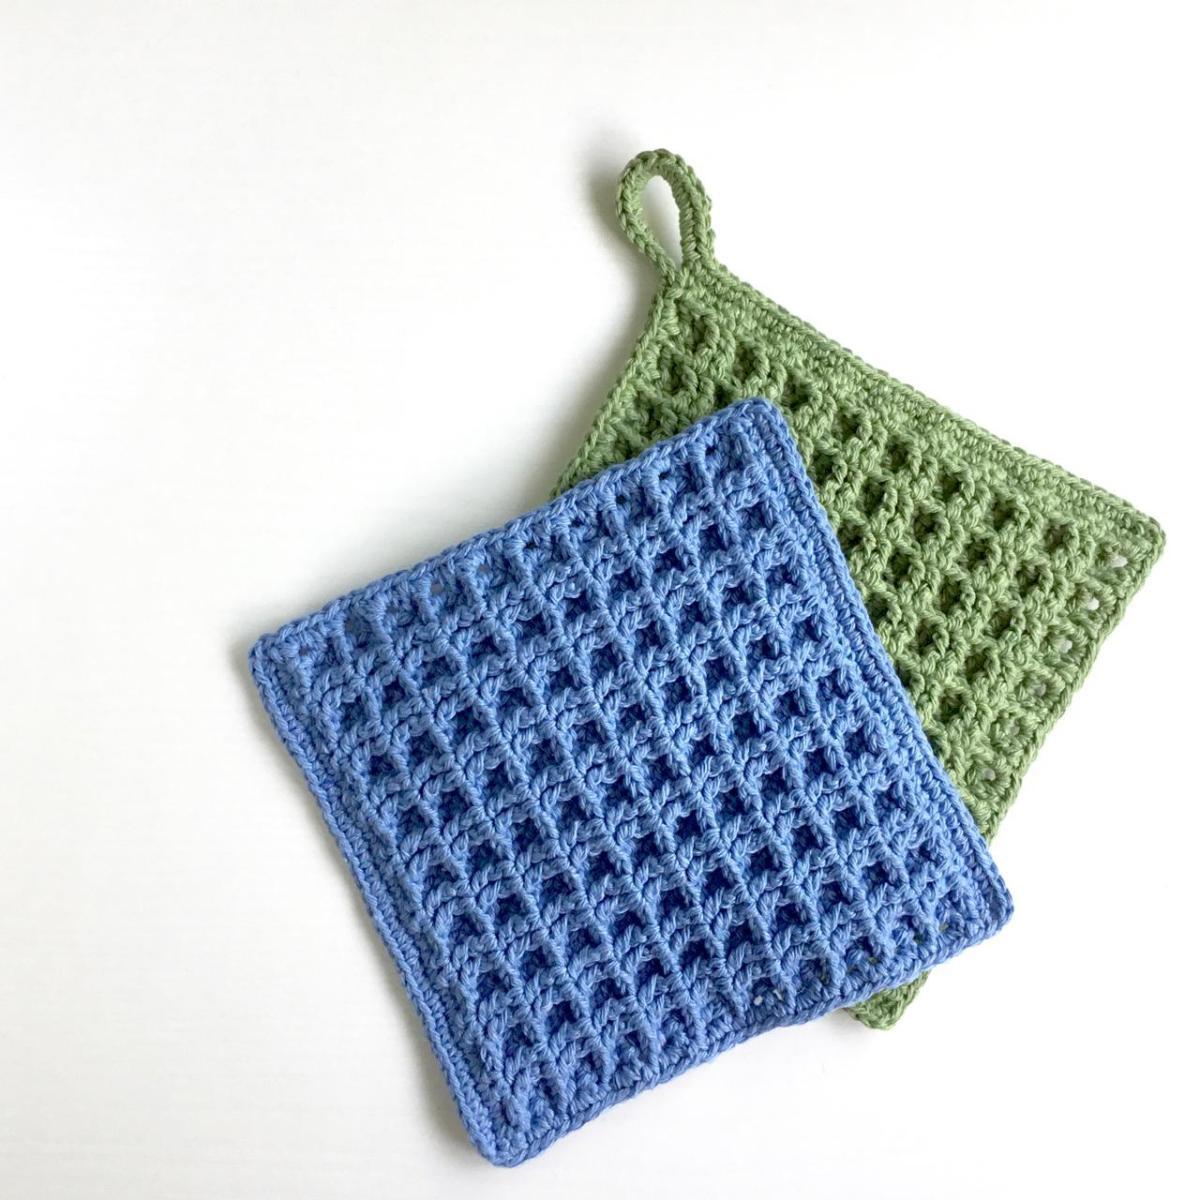 Square Dishcloth Crochet Pattern in Waffle Stitch